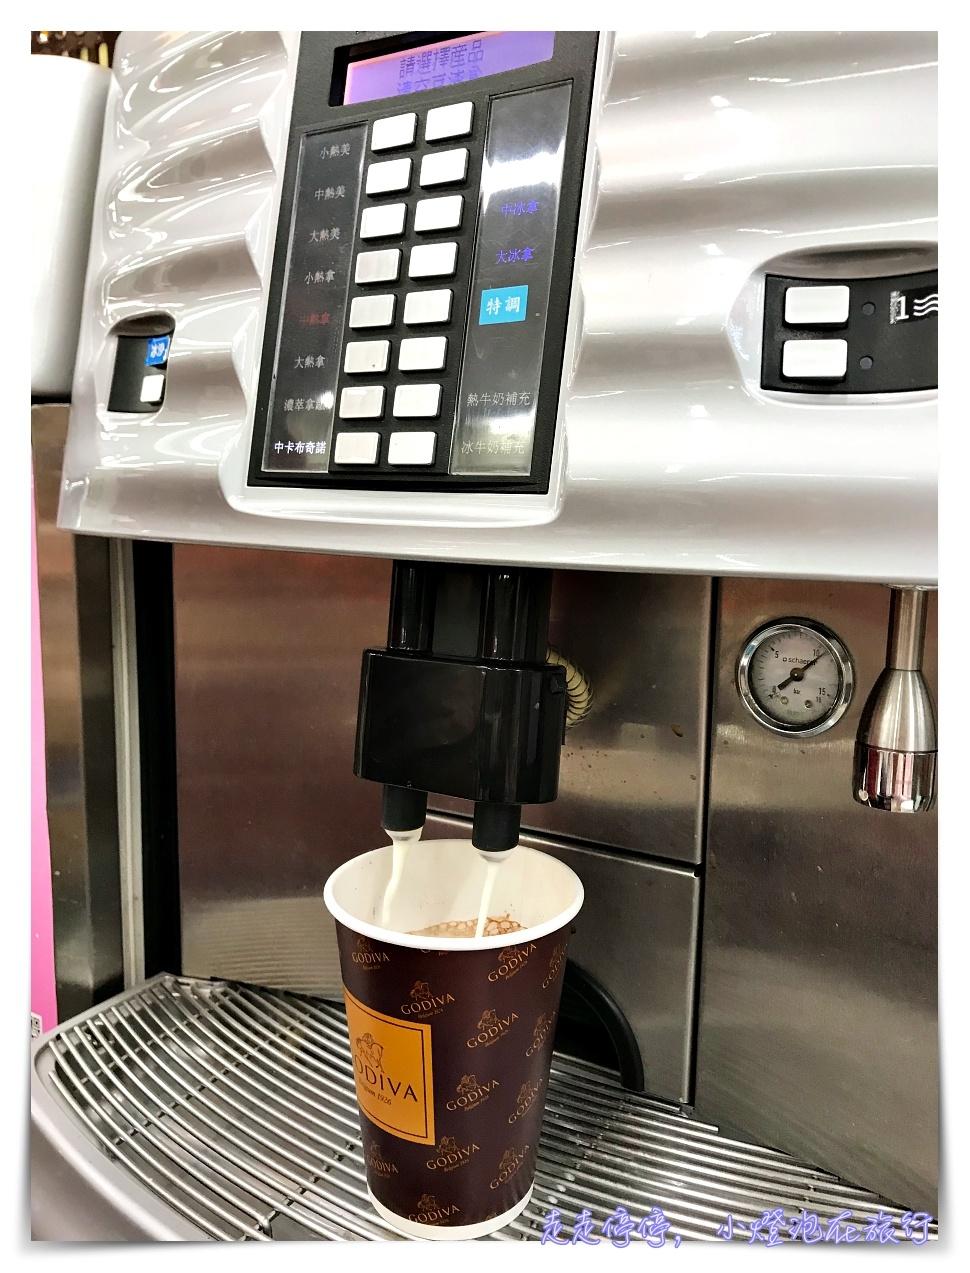 7-11 Godiva經典熱巧克力飲品限量發售,冷冷的天,讓熱巧克力溫暖你吧!12/20起熱情放送~